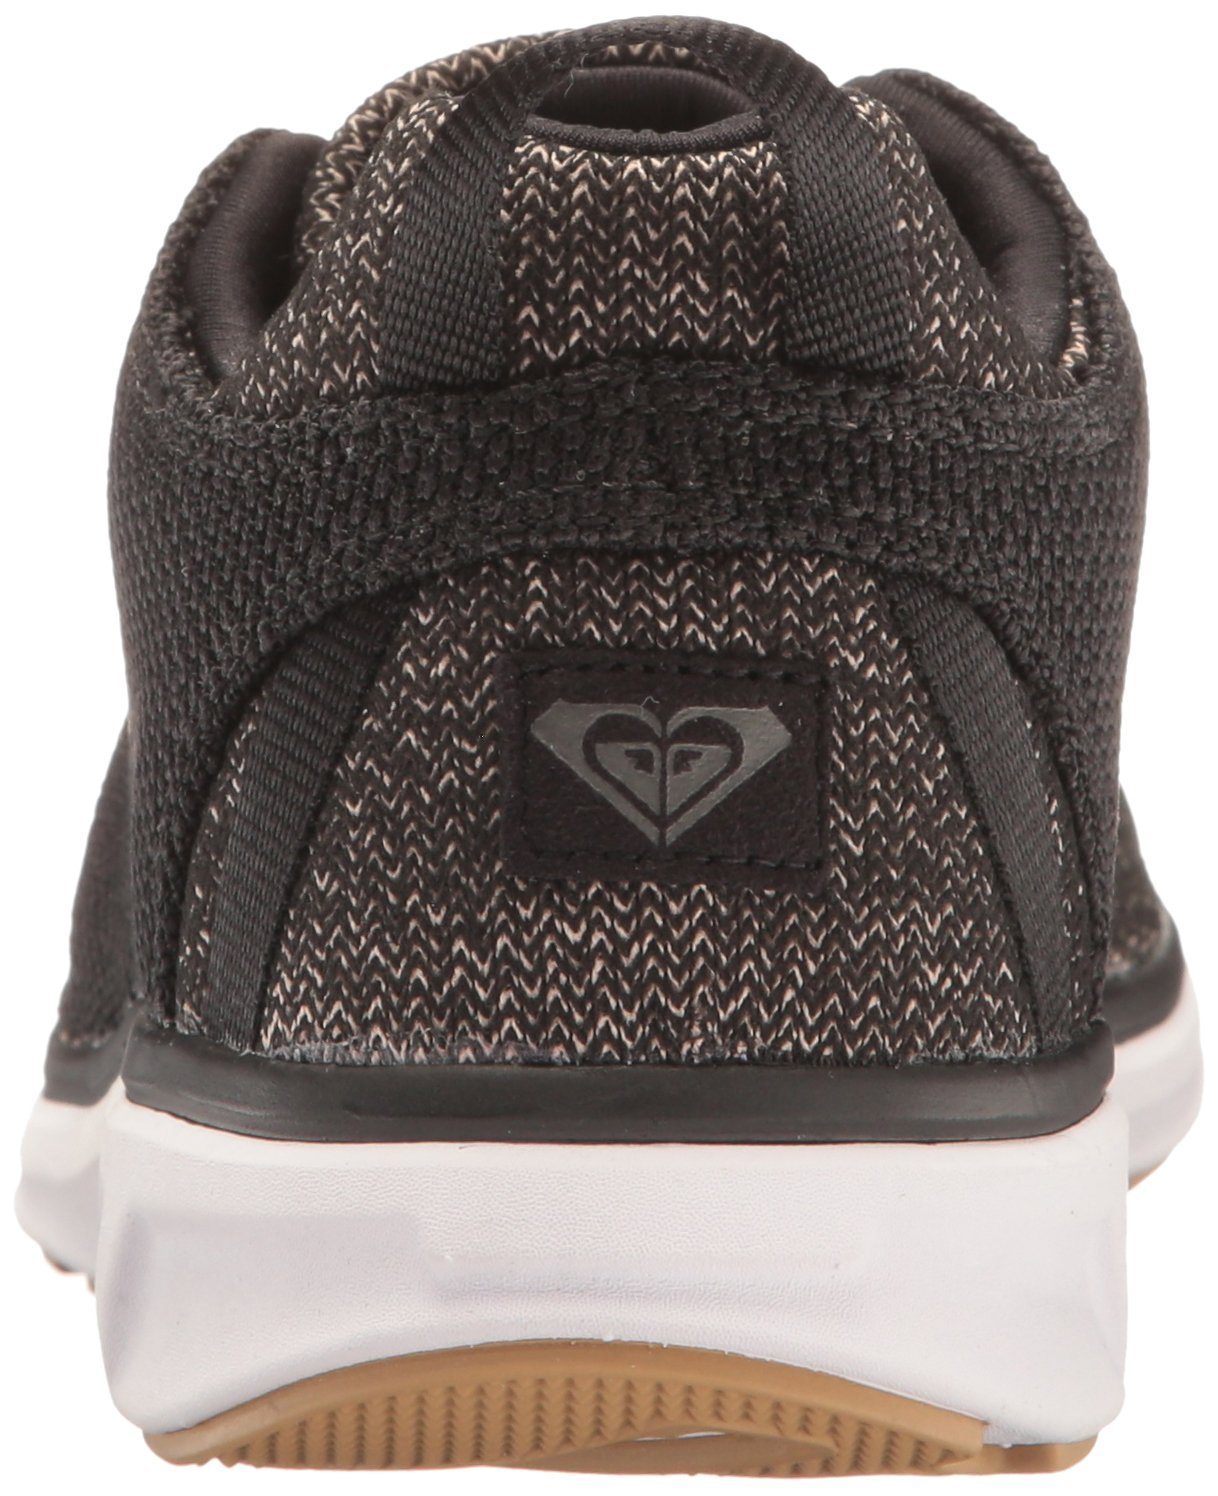 Roxy Women's Set Session Athletic Walking Shoe B01MXTTX3R 6 B(M) US|Anthracite